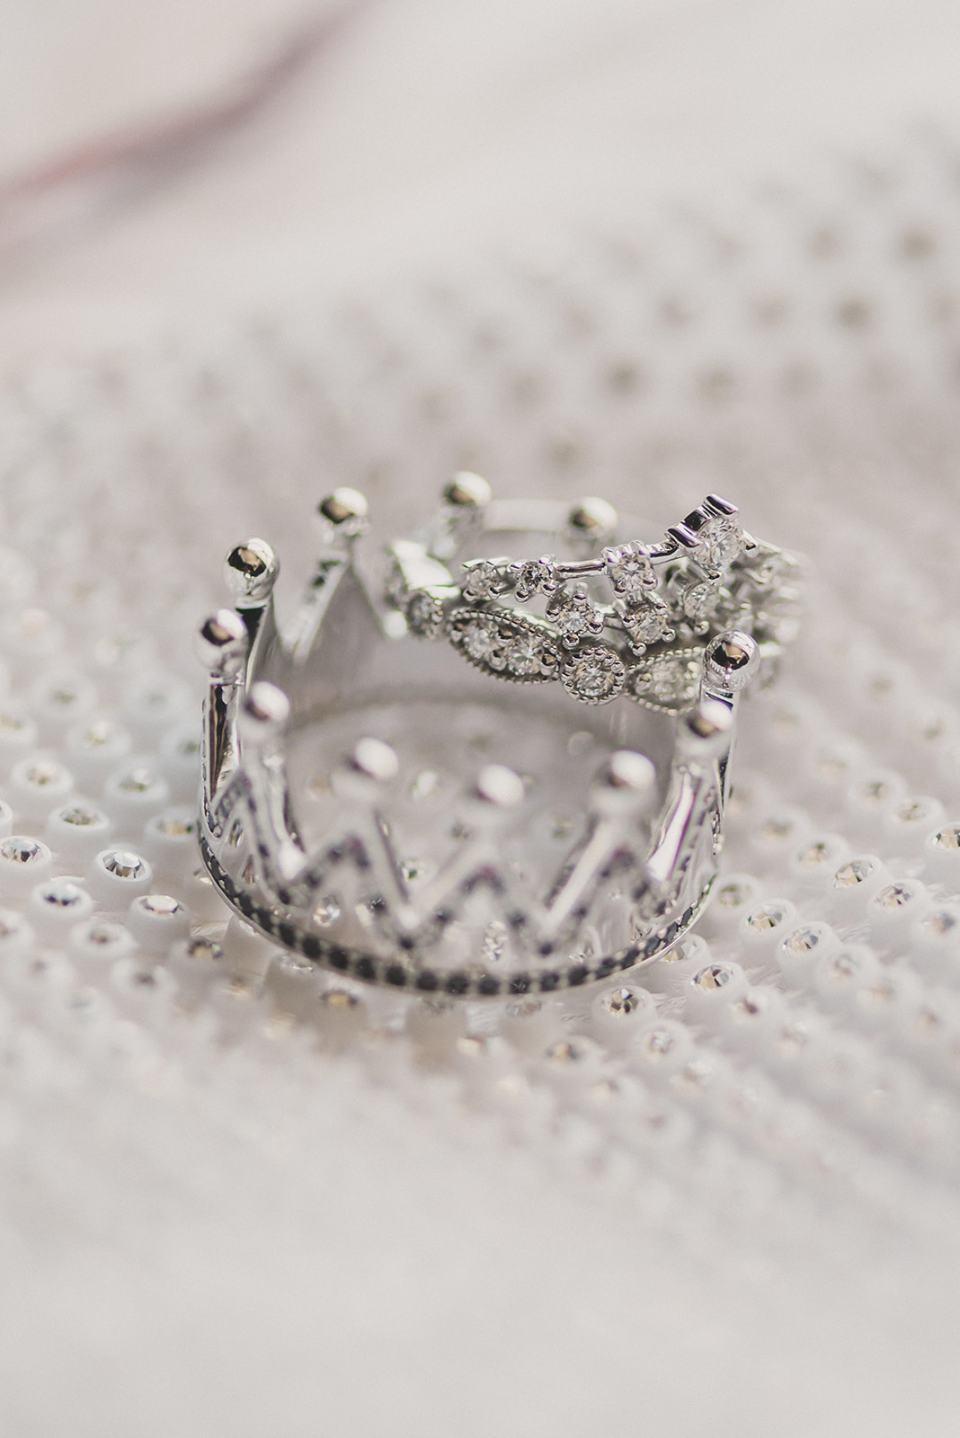 custom wedding rings for Las Vegas wedding day